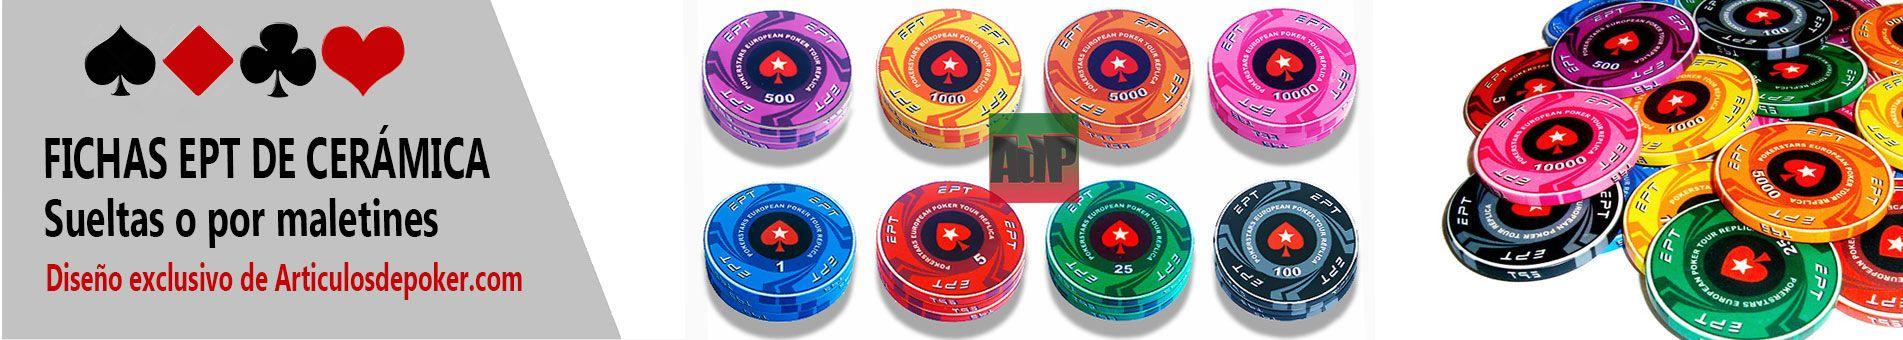 Fichas de cerámica EPT